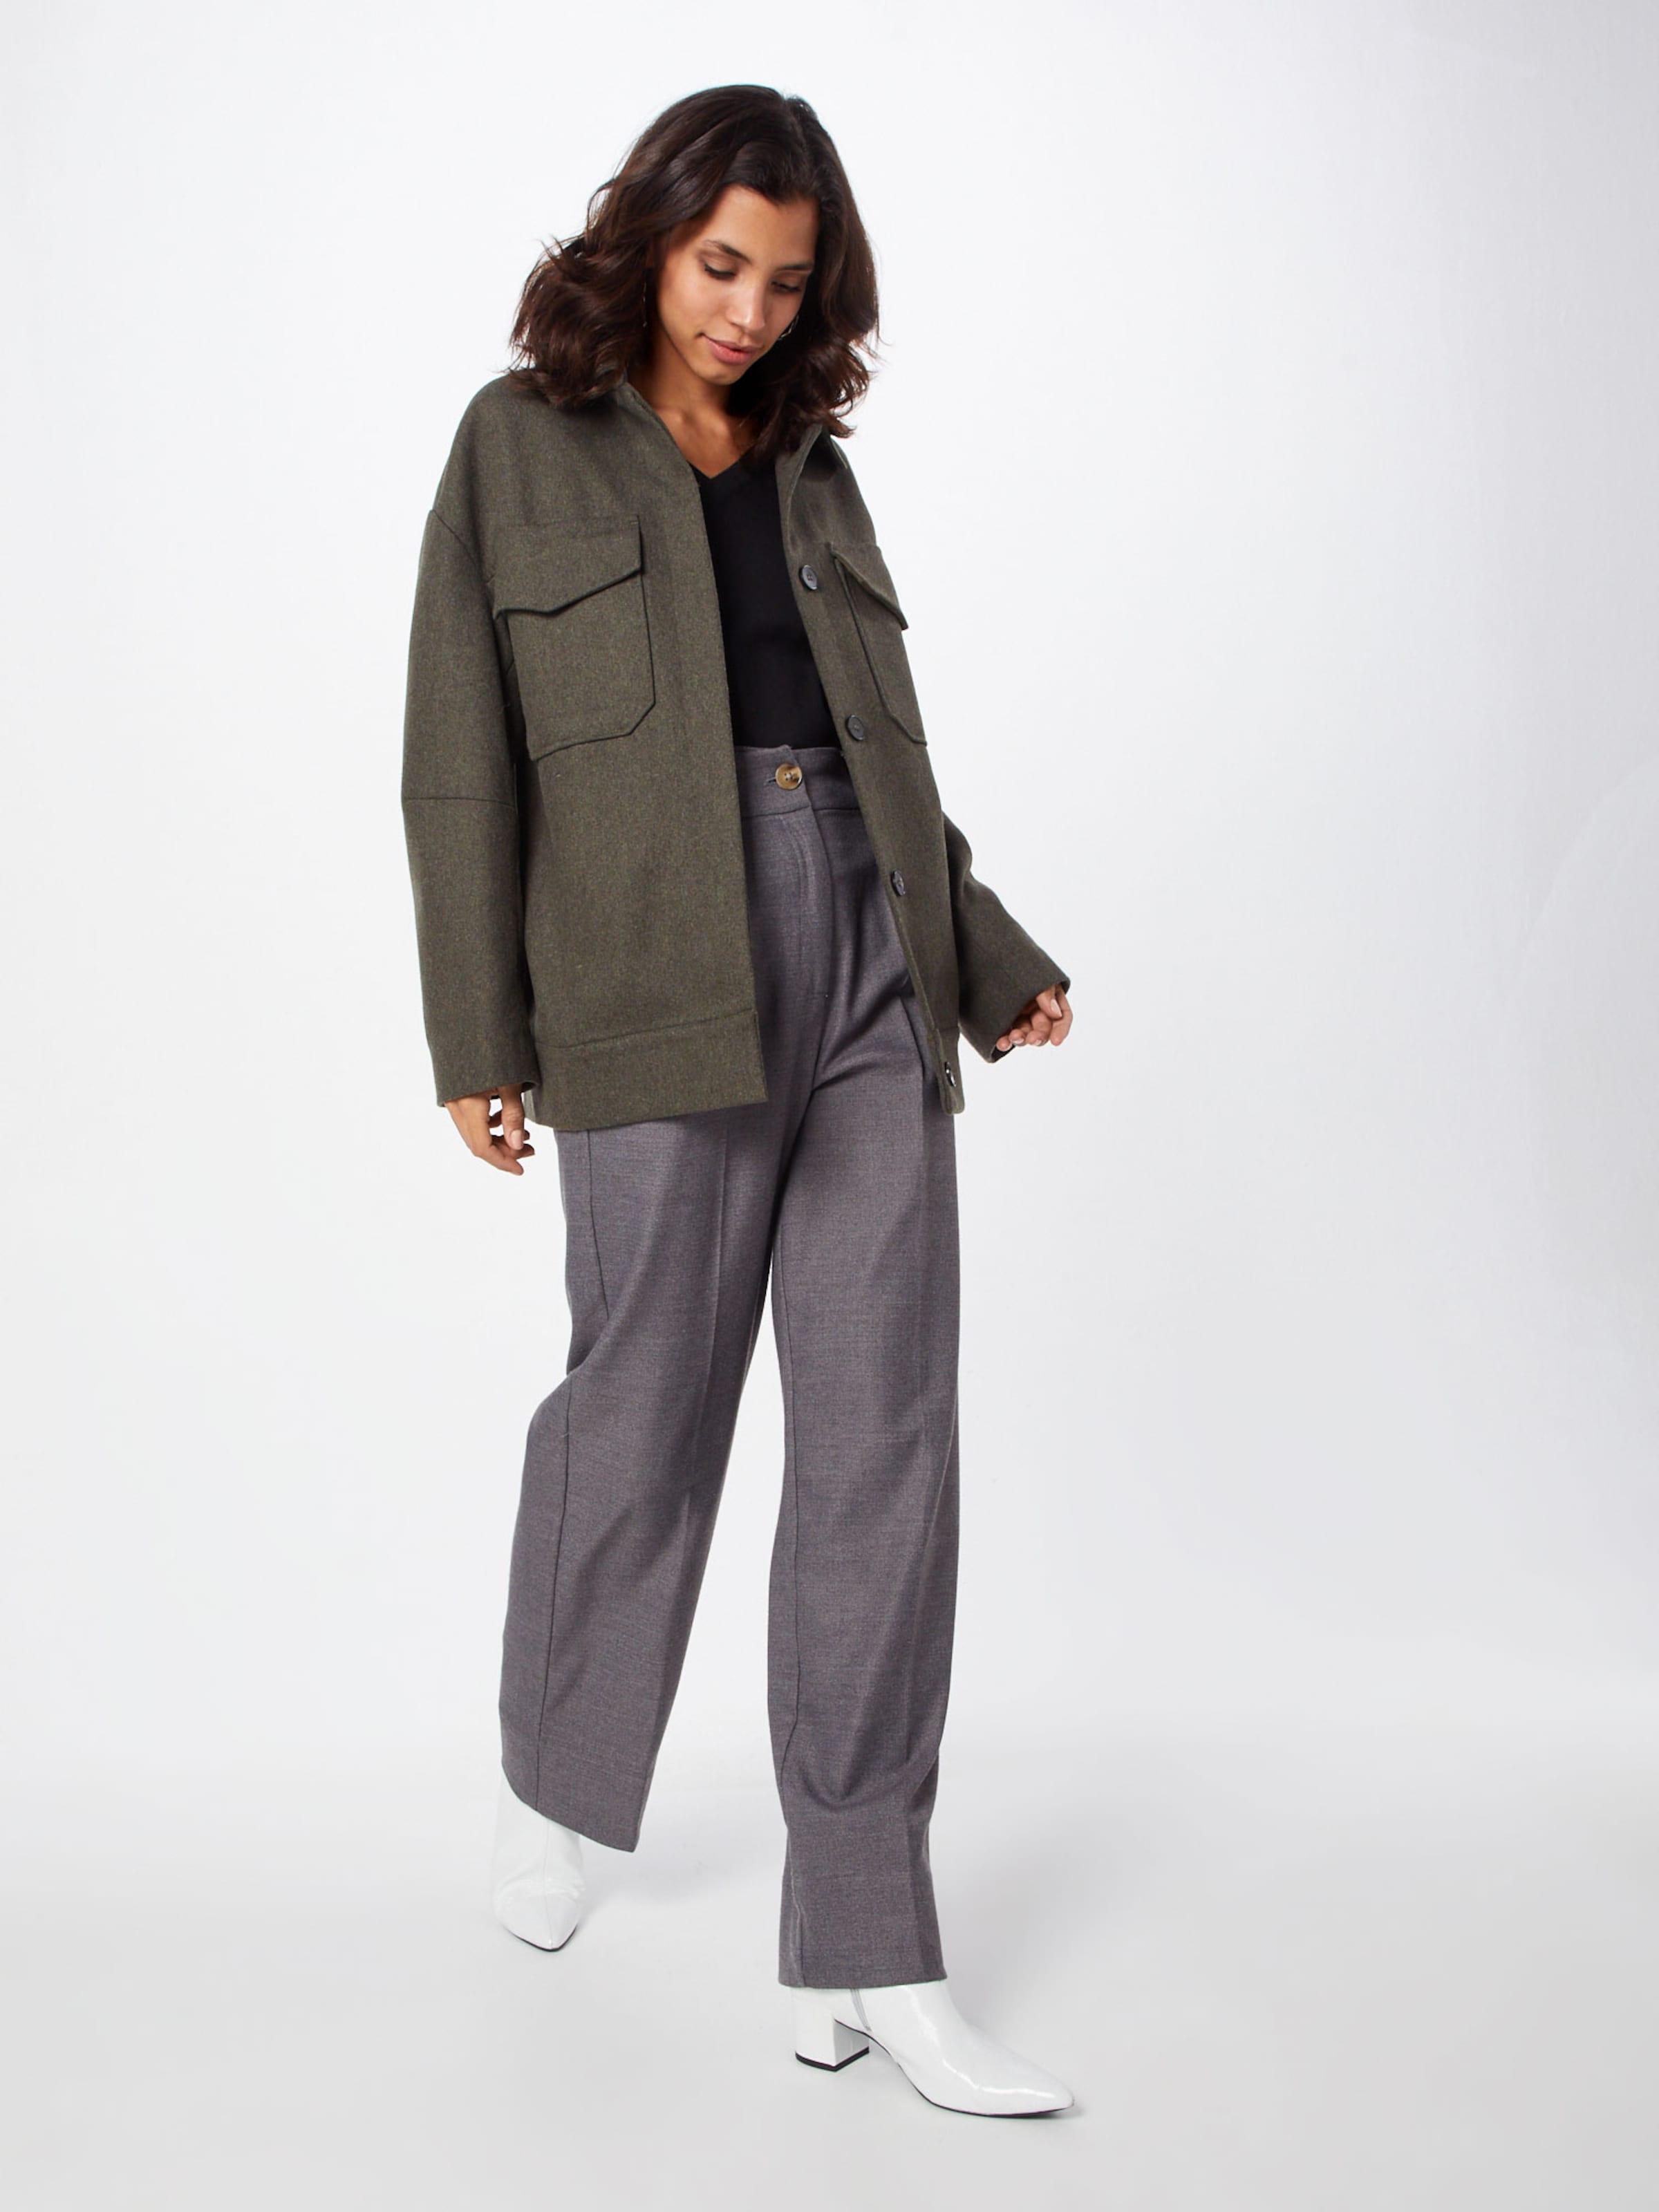 Pullover Lacoste Pullover Schwarz In Schwarz Lacoste In v8Onm0wN